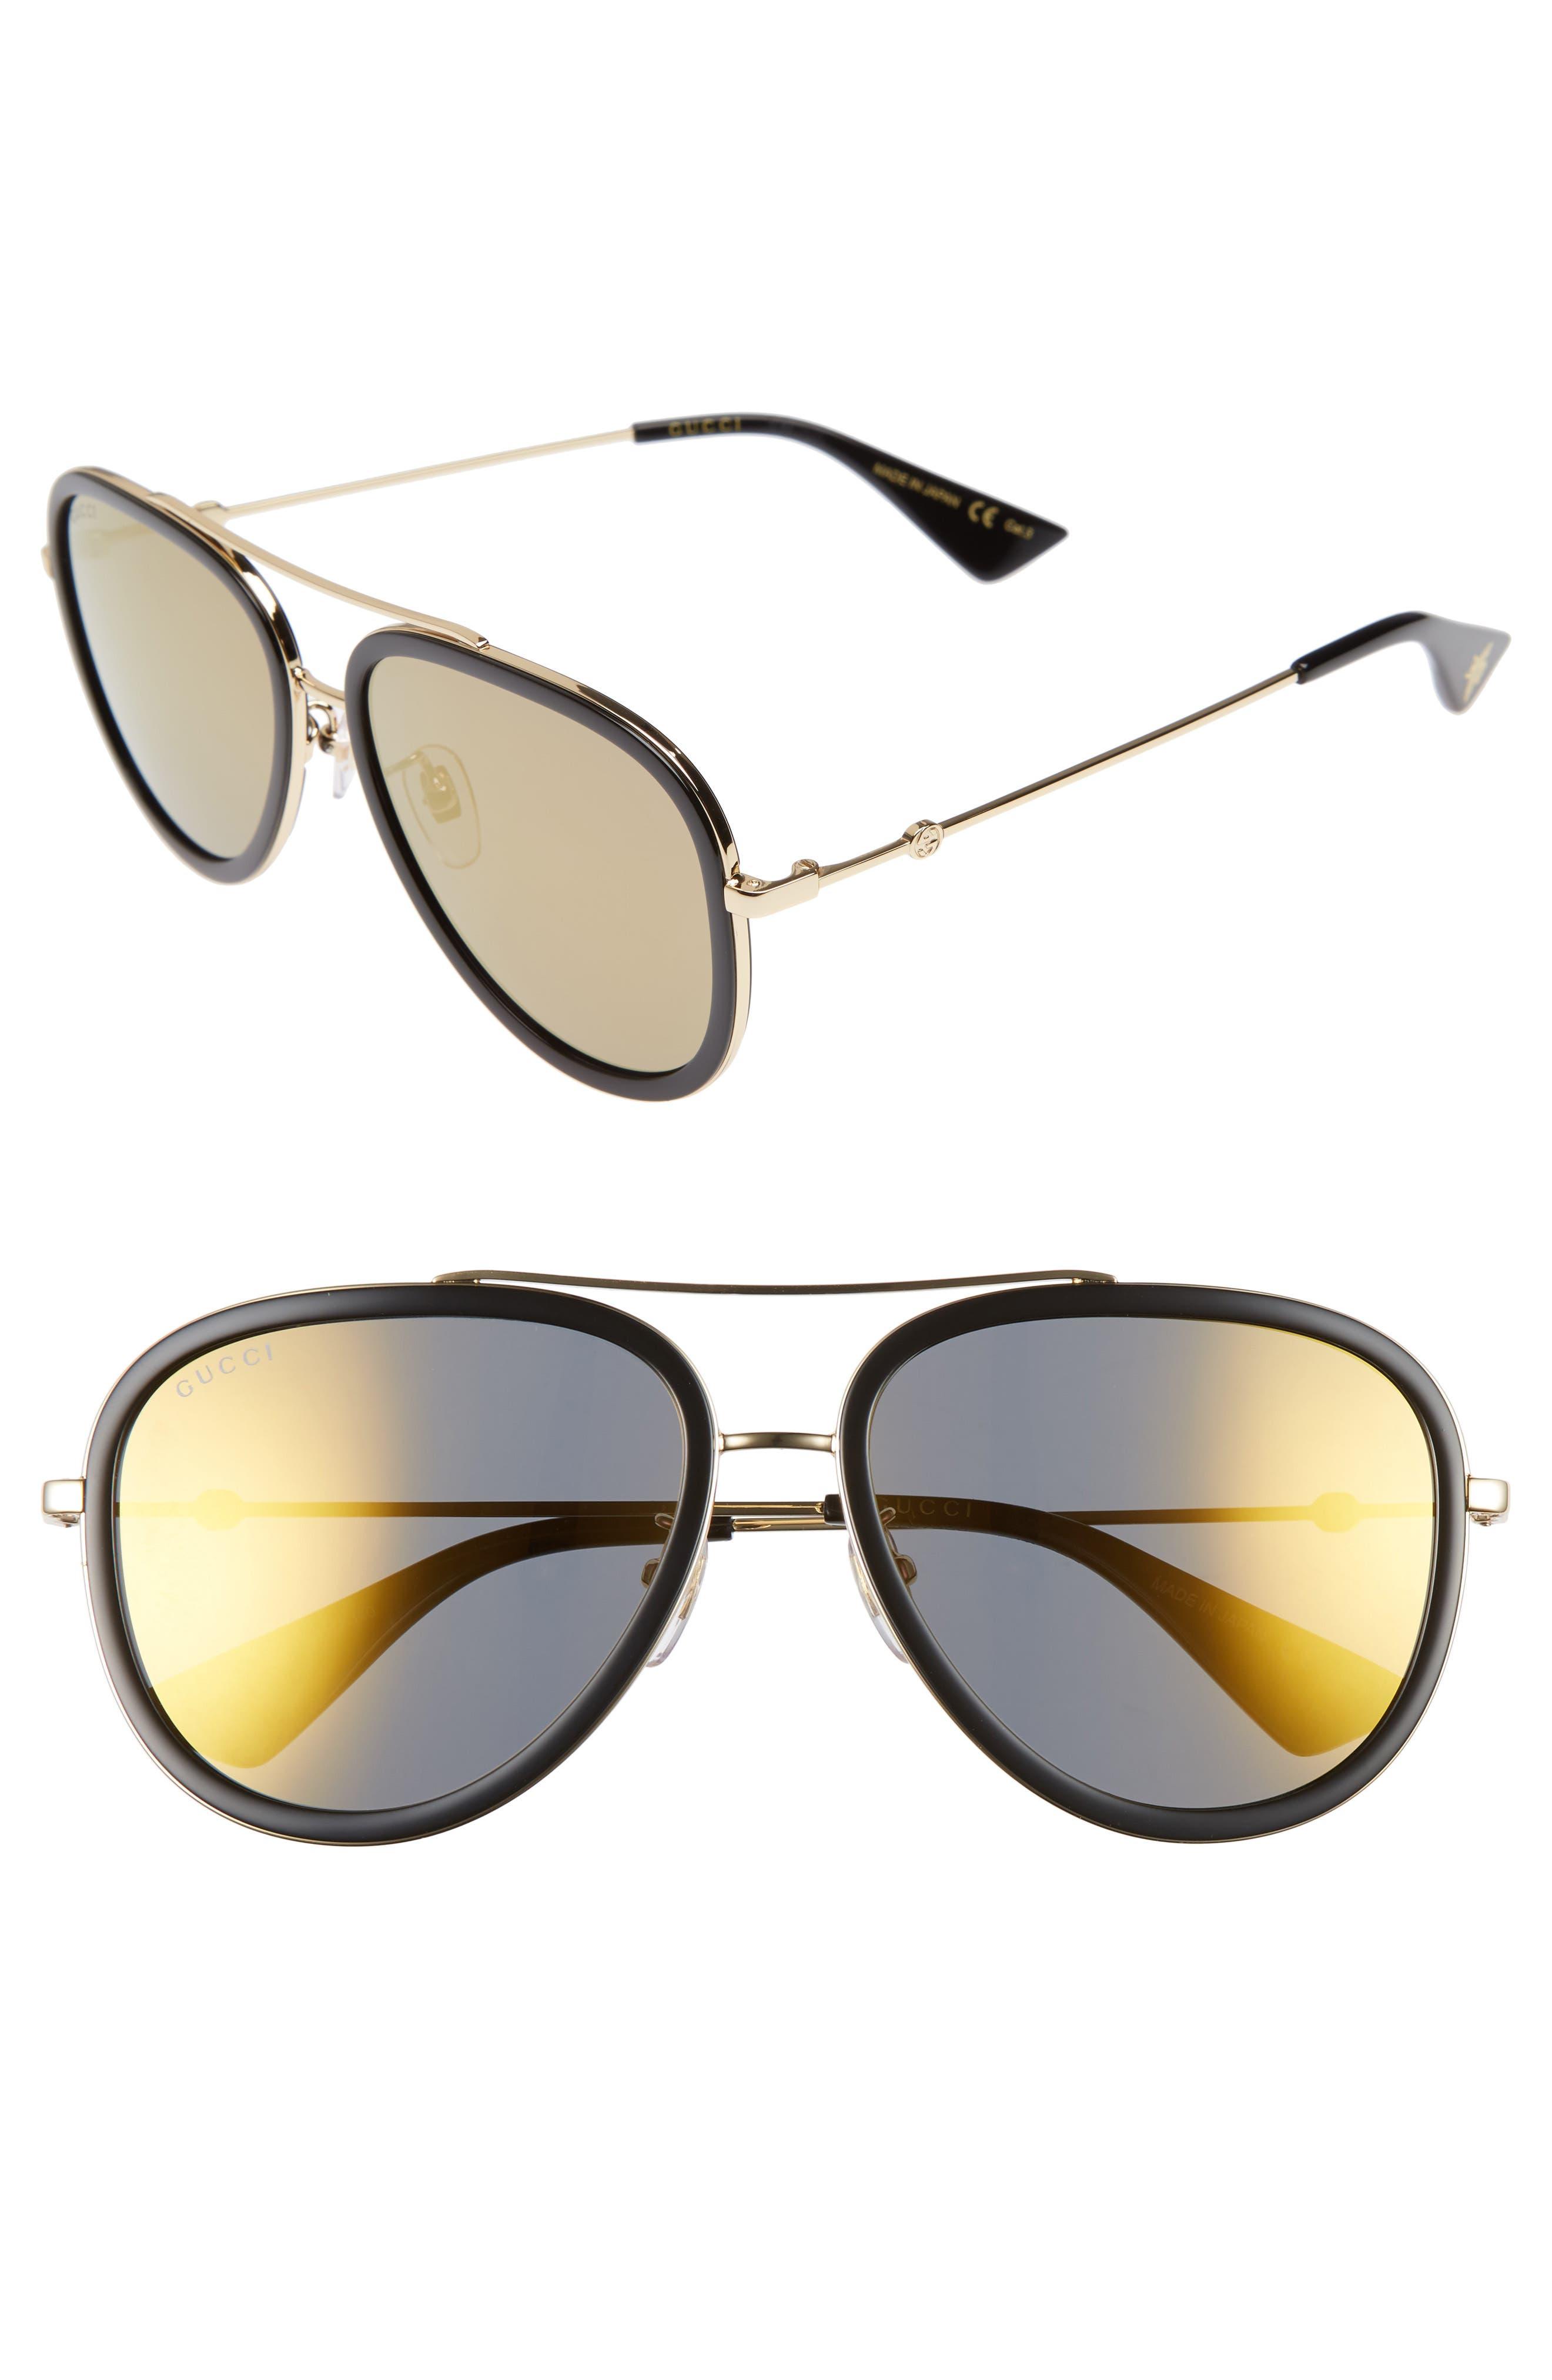 Main Image - Gucci 57mm Aivator Sunglasses